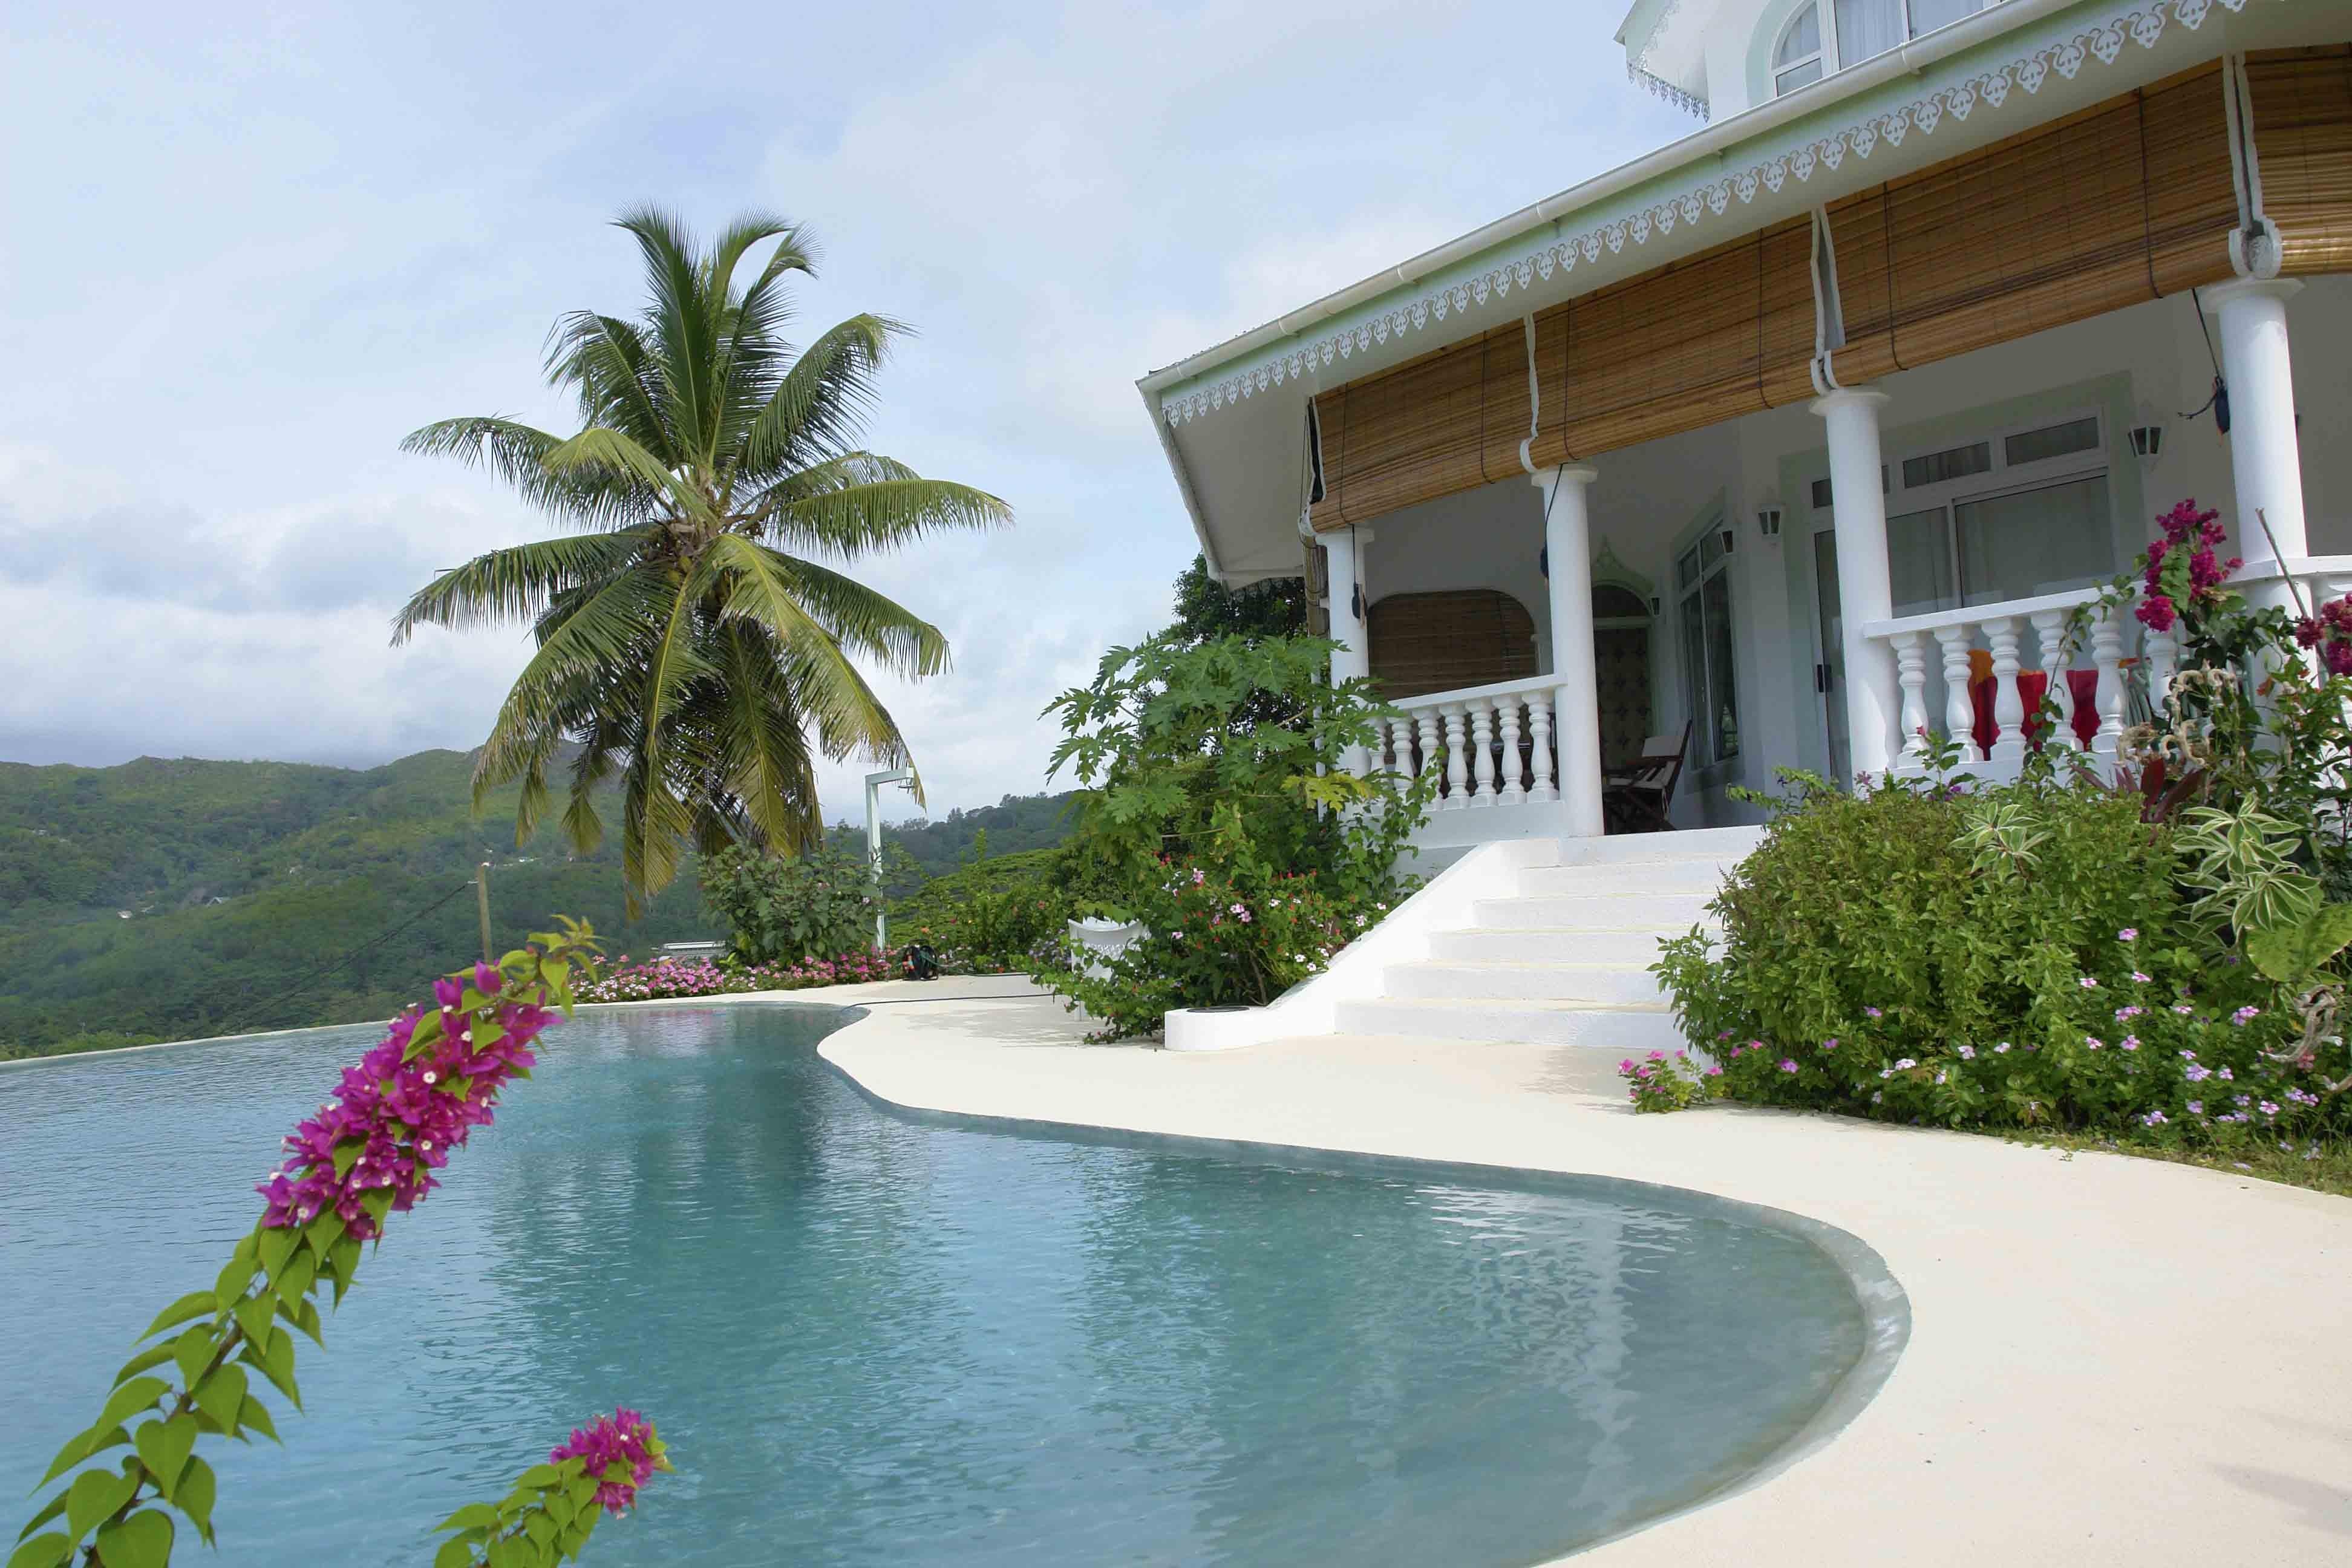 ڤيلا ماهي Villa Mahe' - الحدائق